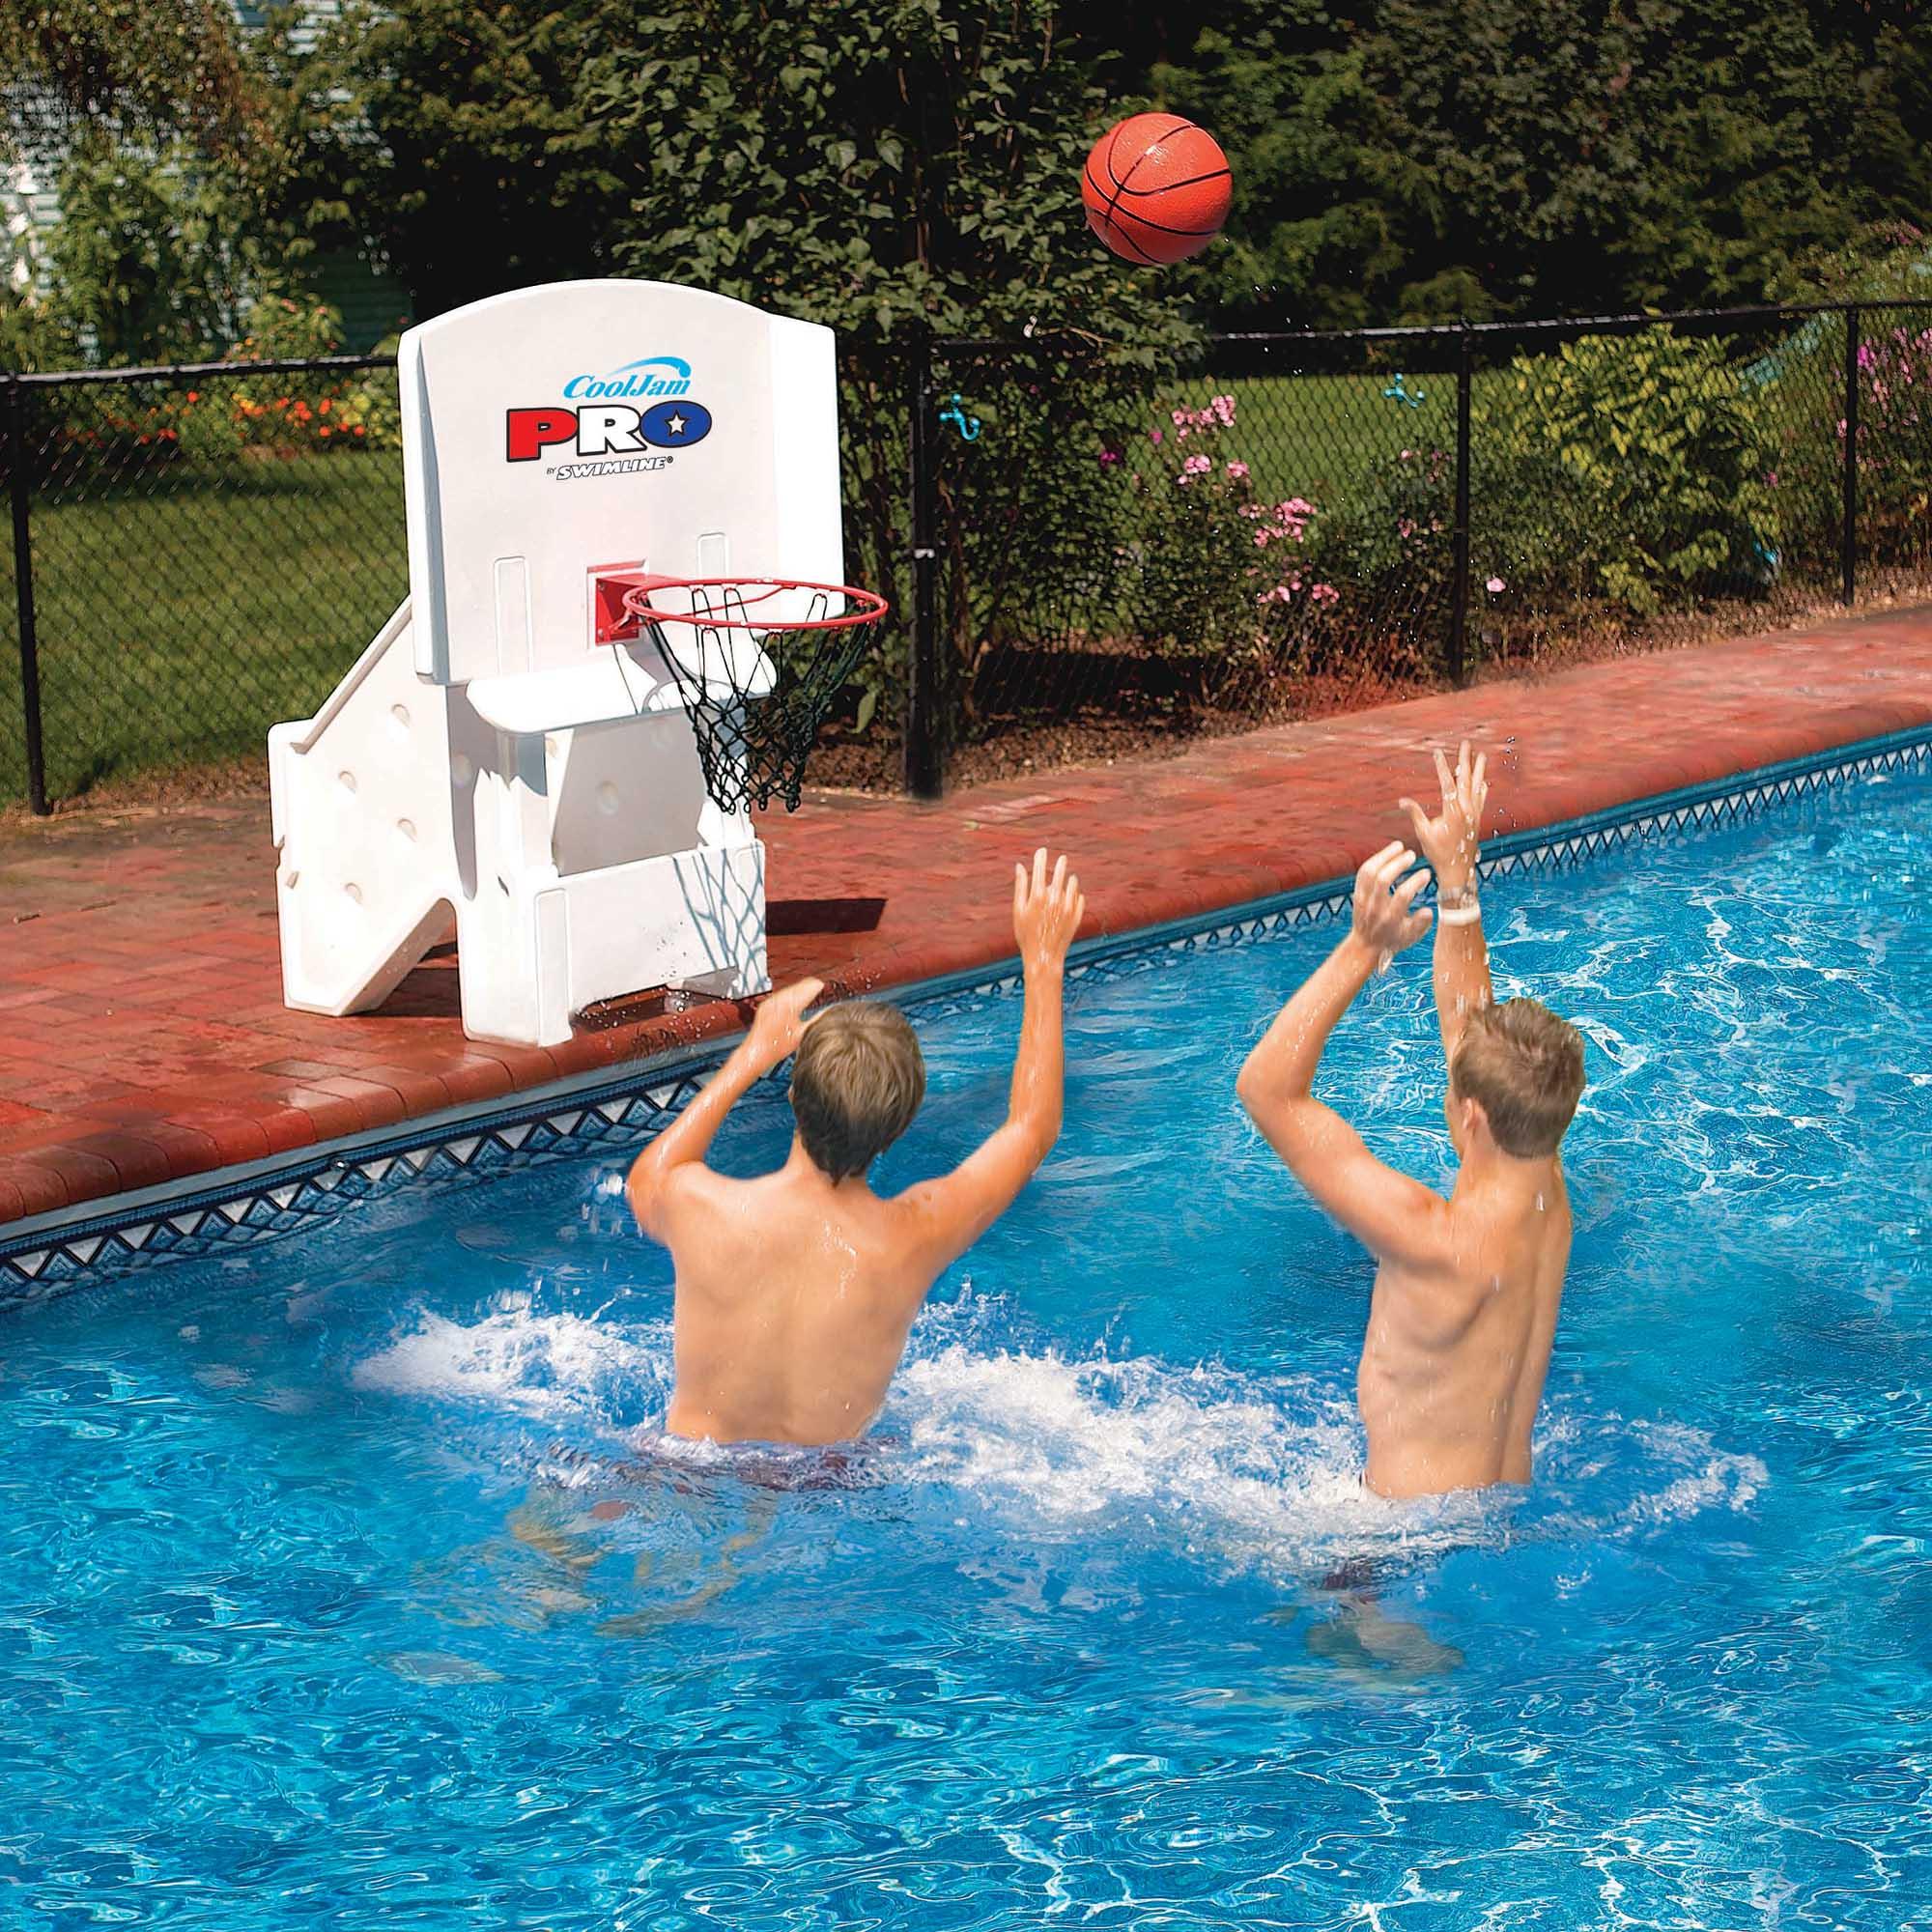 Swimline super wide cool jam pro inground swimming pool basketball hoop 9195 691060163158 ebay - Pool basketball ...